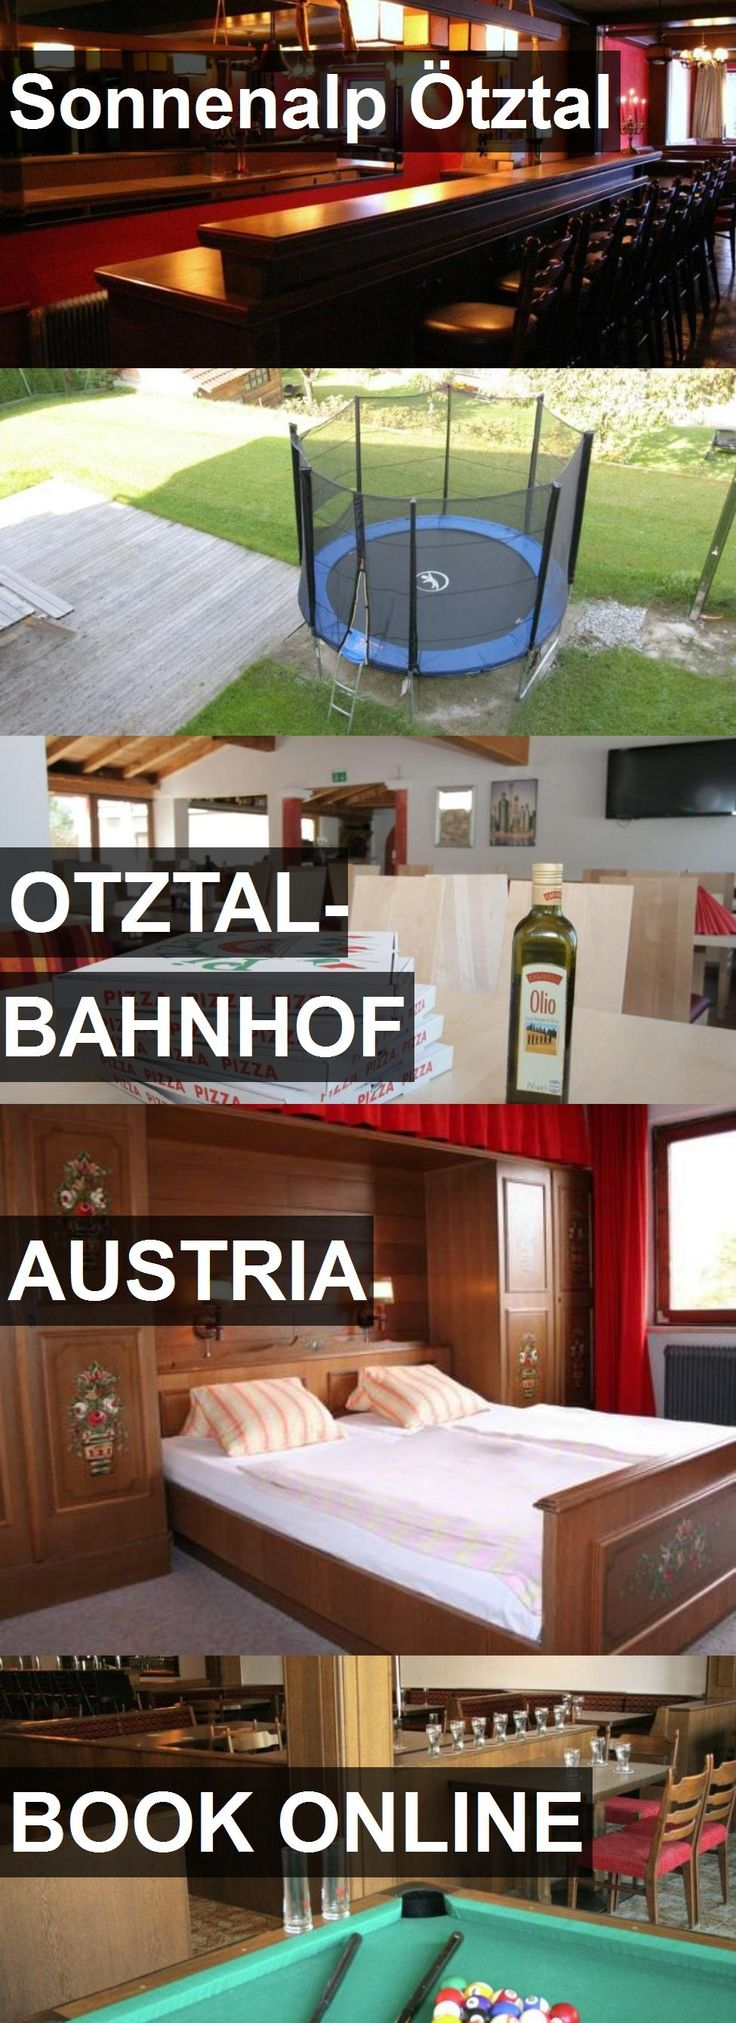 Hotel Sonnenalp Ötztal in Otztal-Bahnhof, Austria. For more information, photos, reviews and best prices please follow the link. #Austria #Otztal-Bahnhof #travel #vacation #hotel